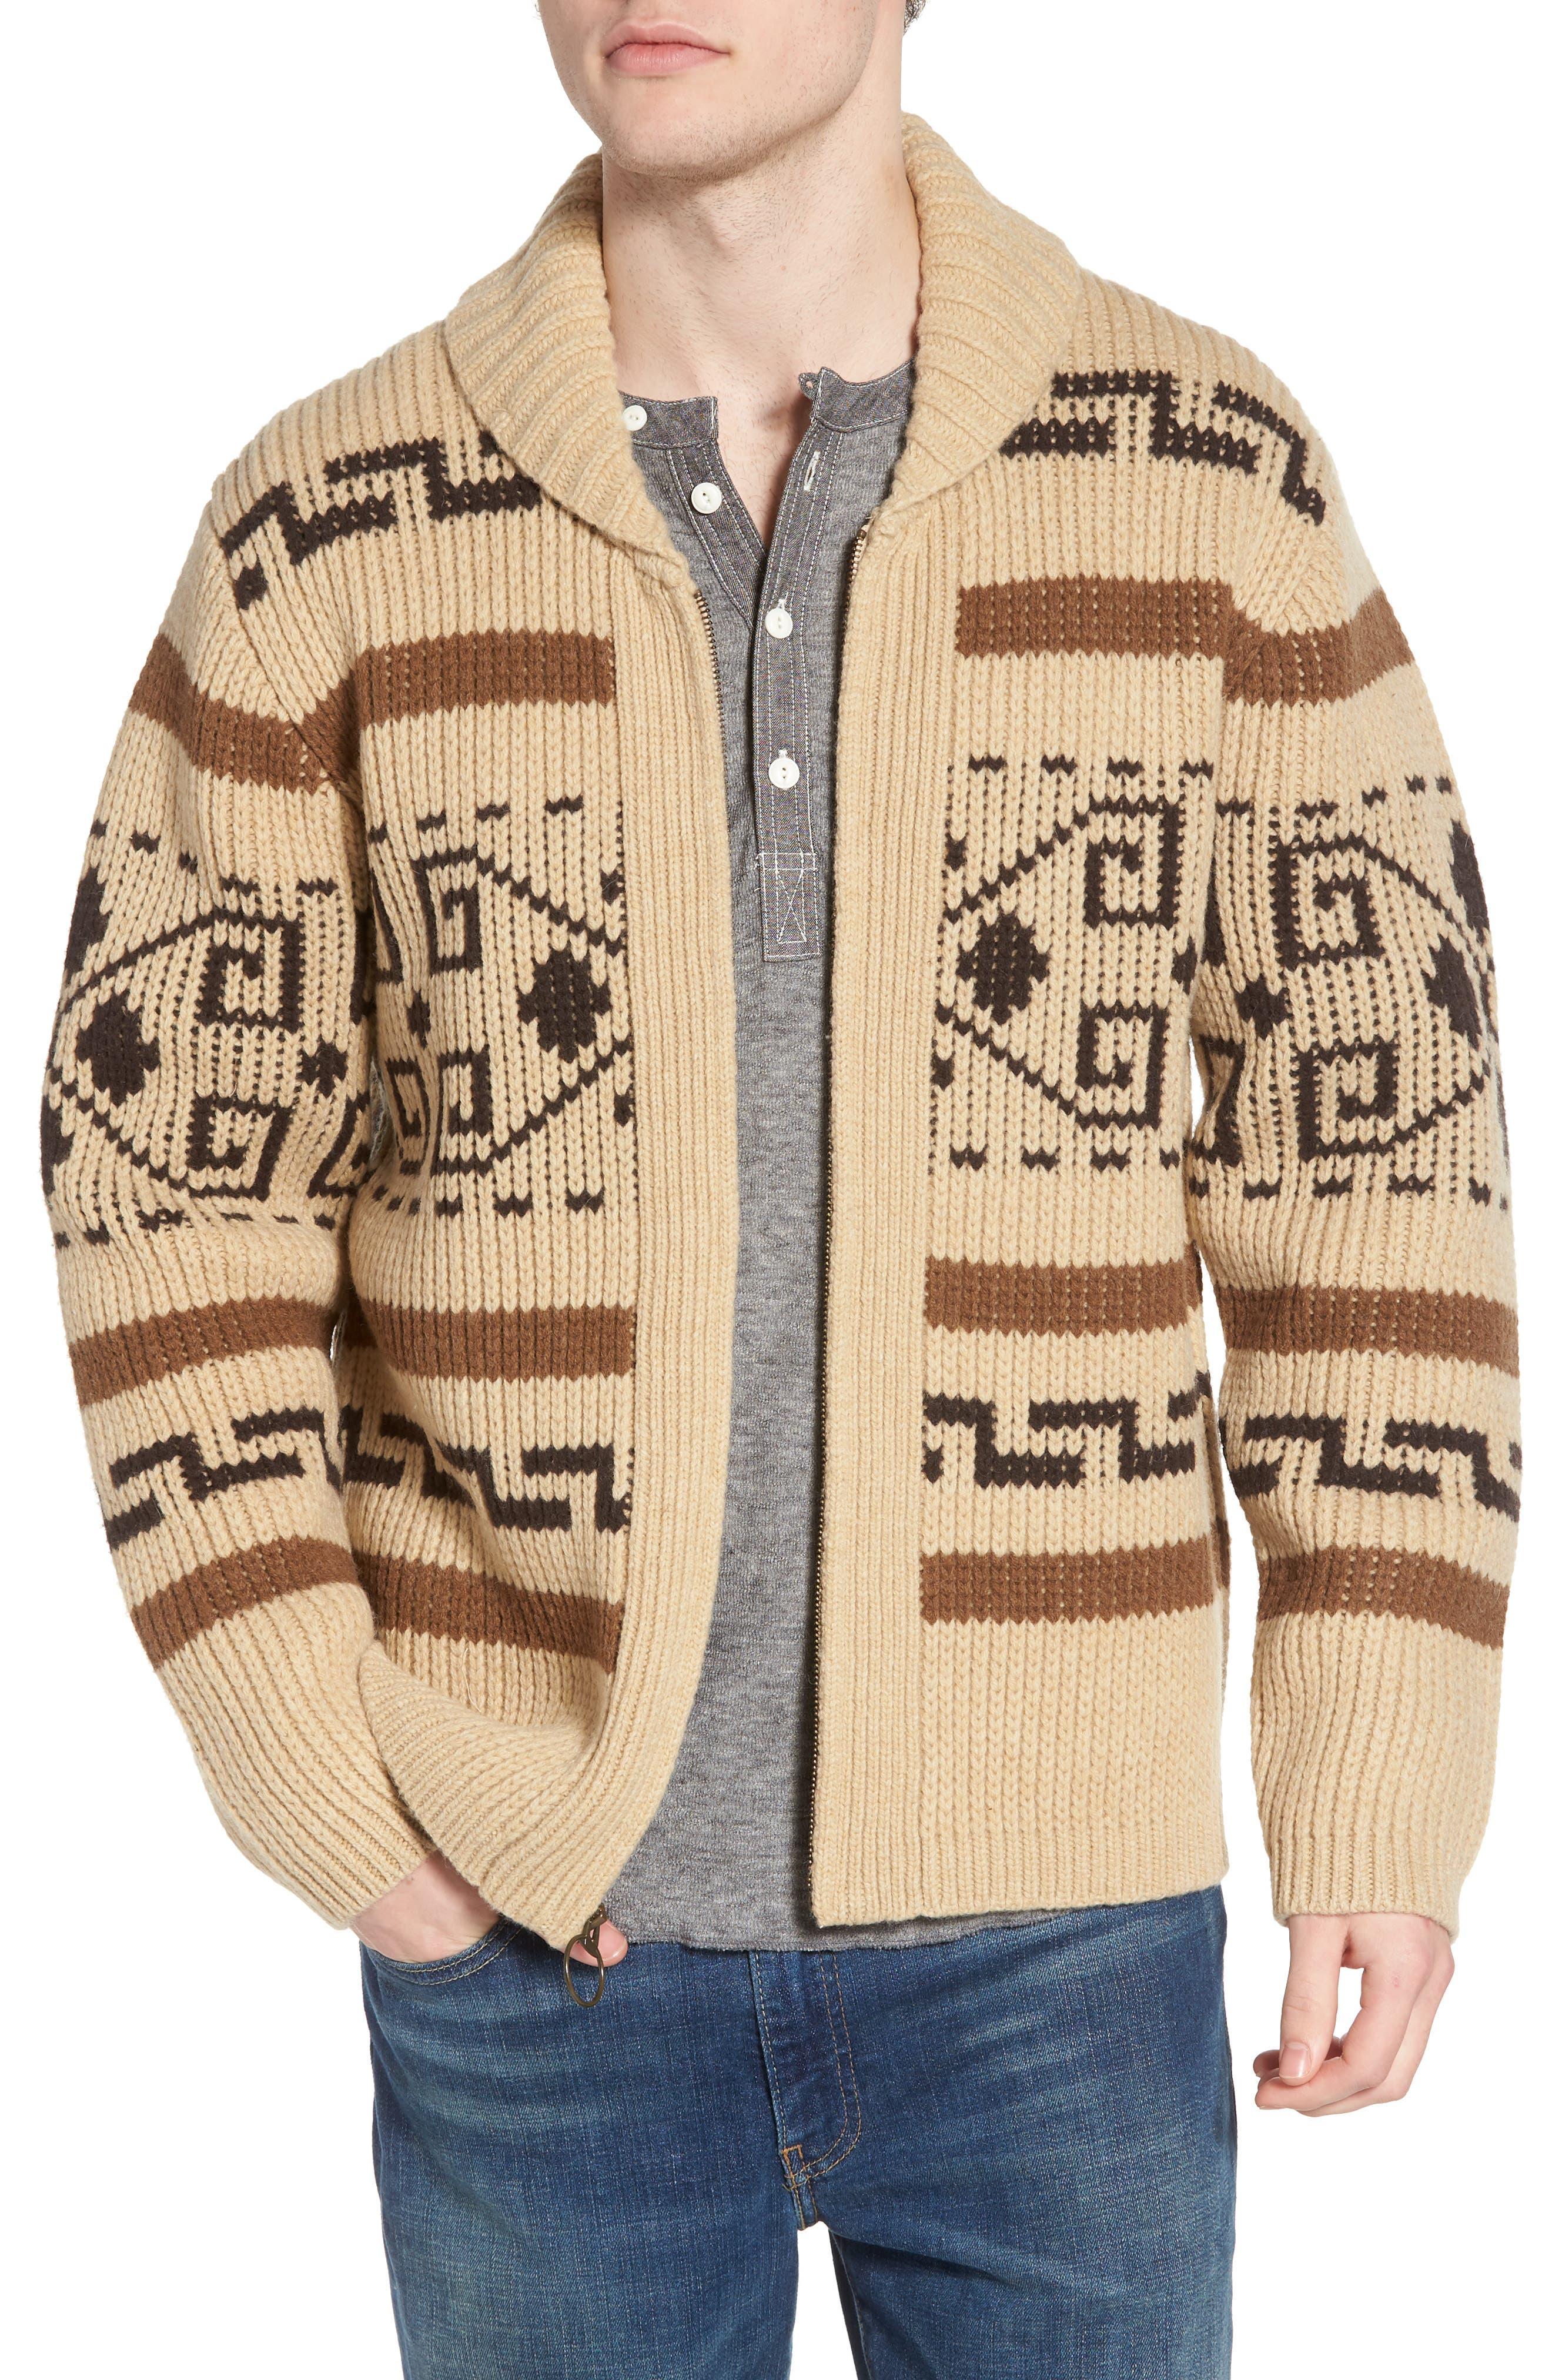 Original Westerly Sweater,                         Main,                         color, 260